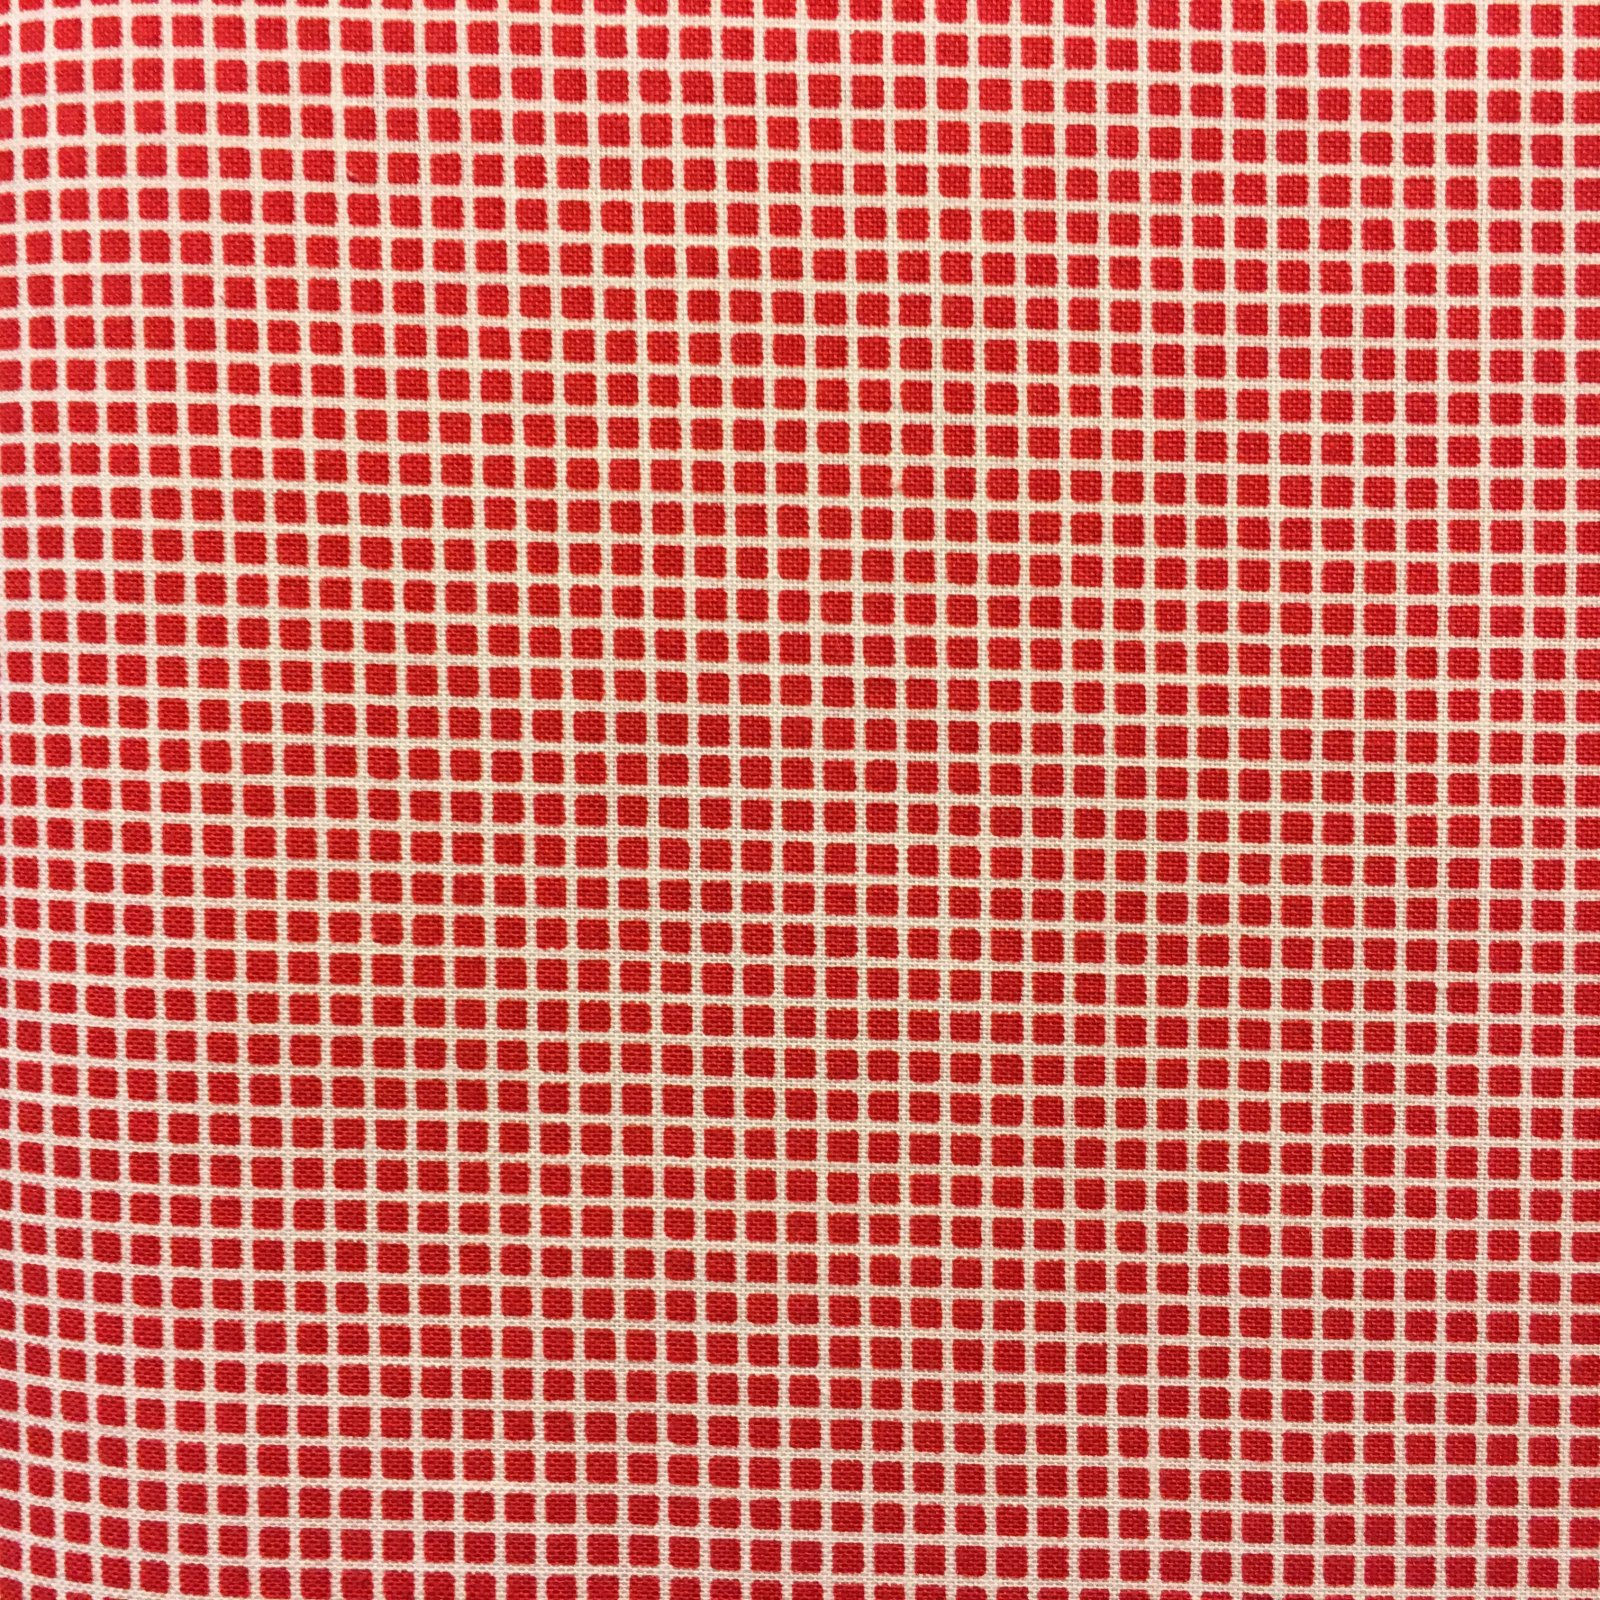 Robert Kaufman Penny's Dollhouse ADZ-15092-3 Red